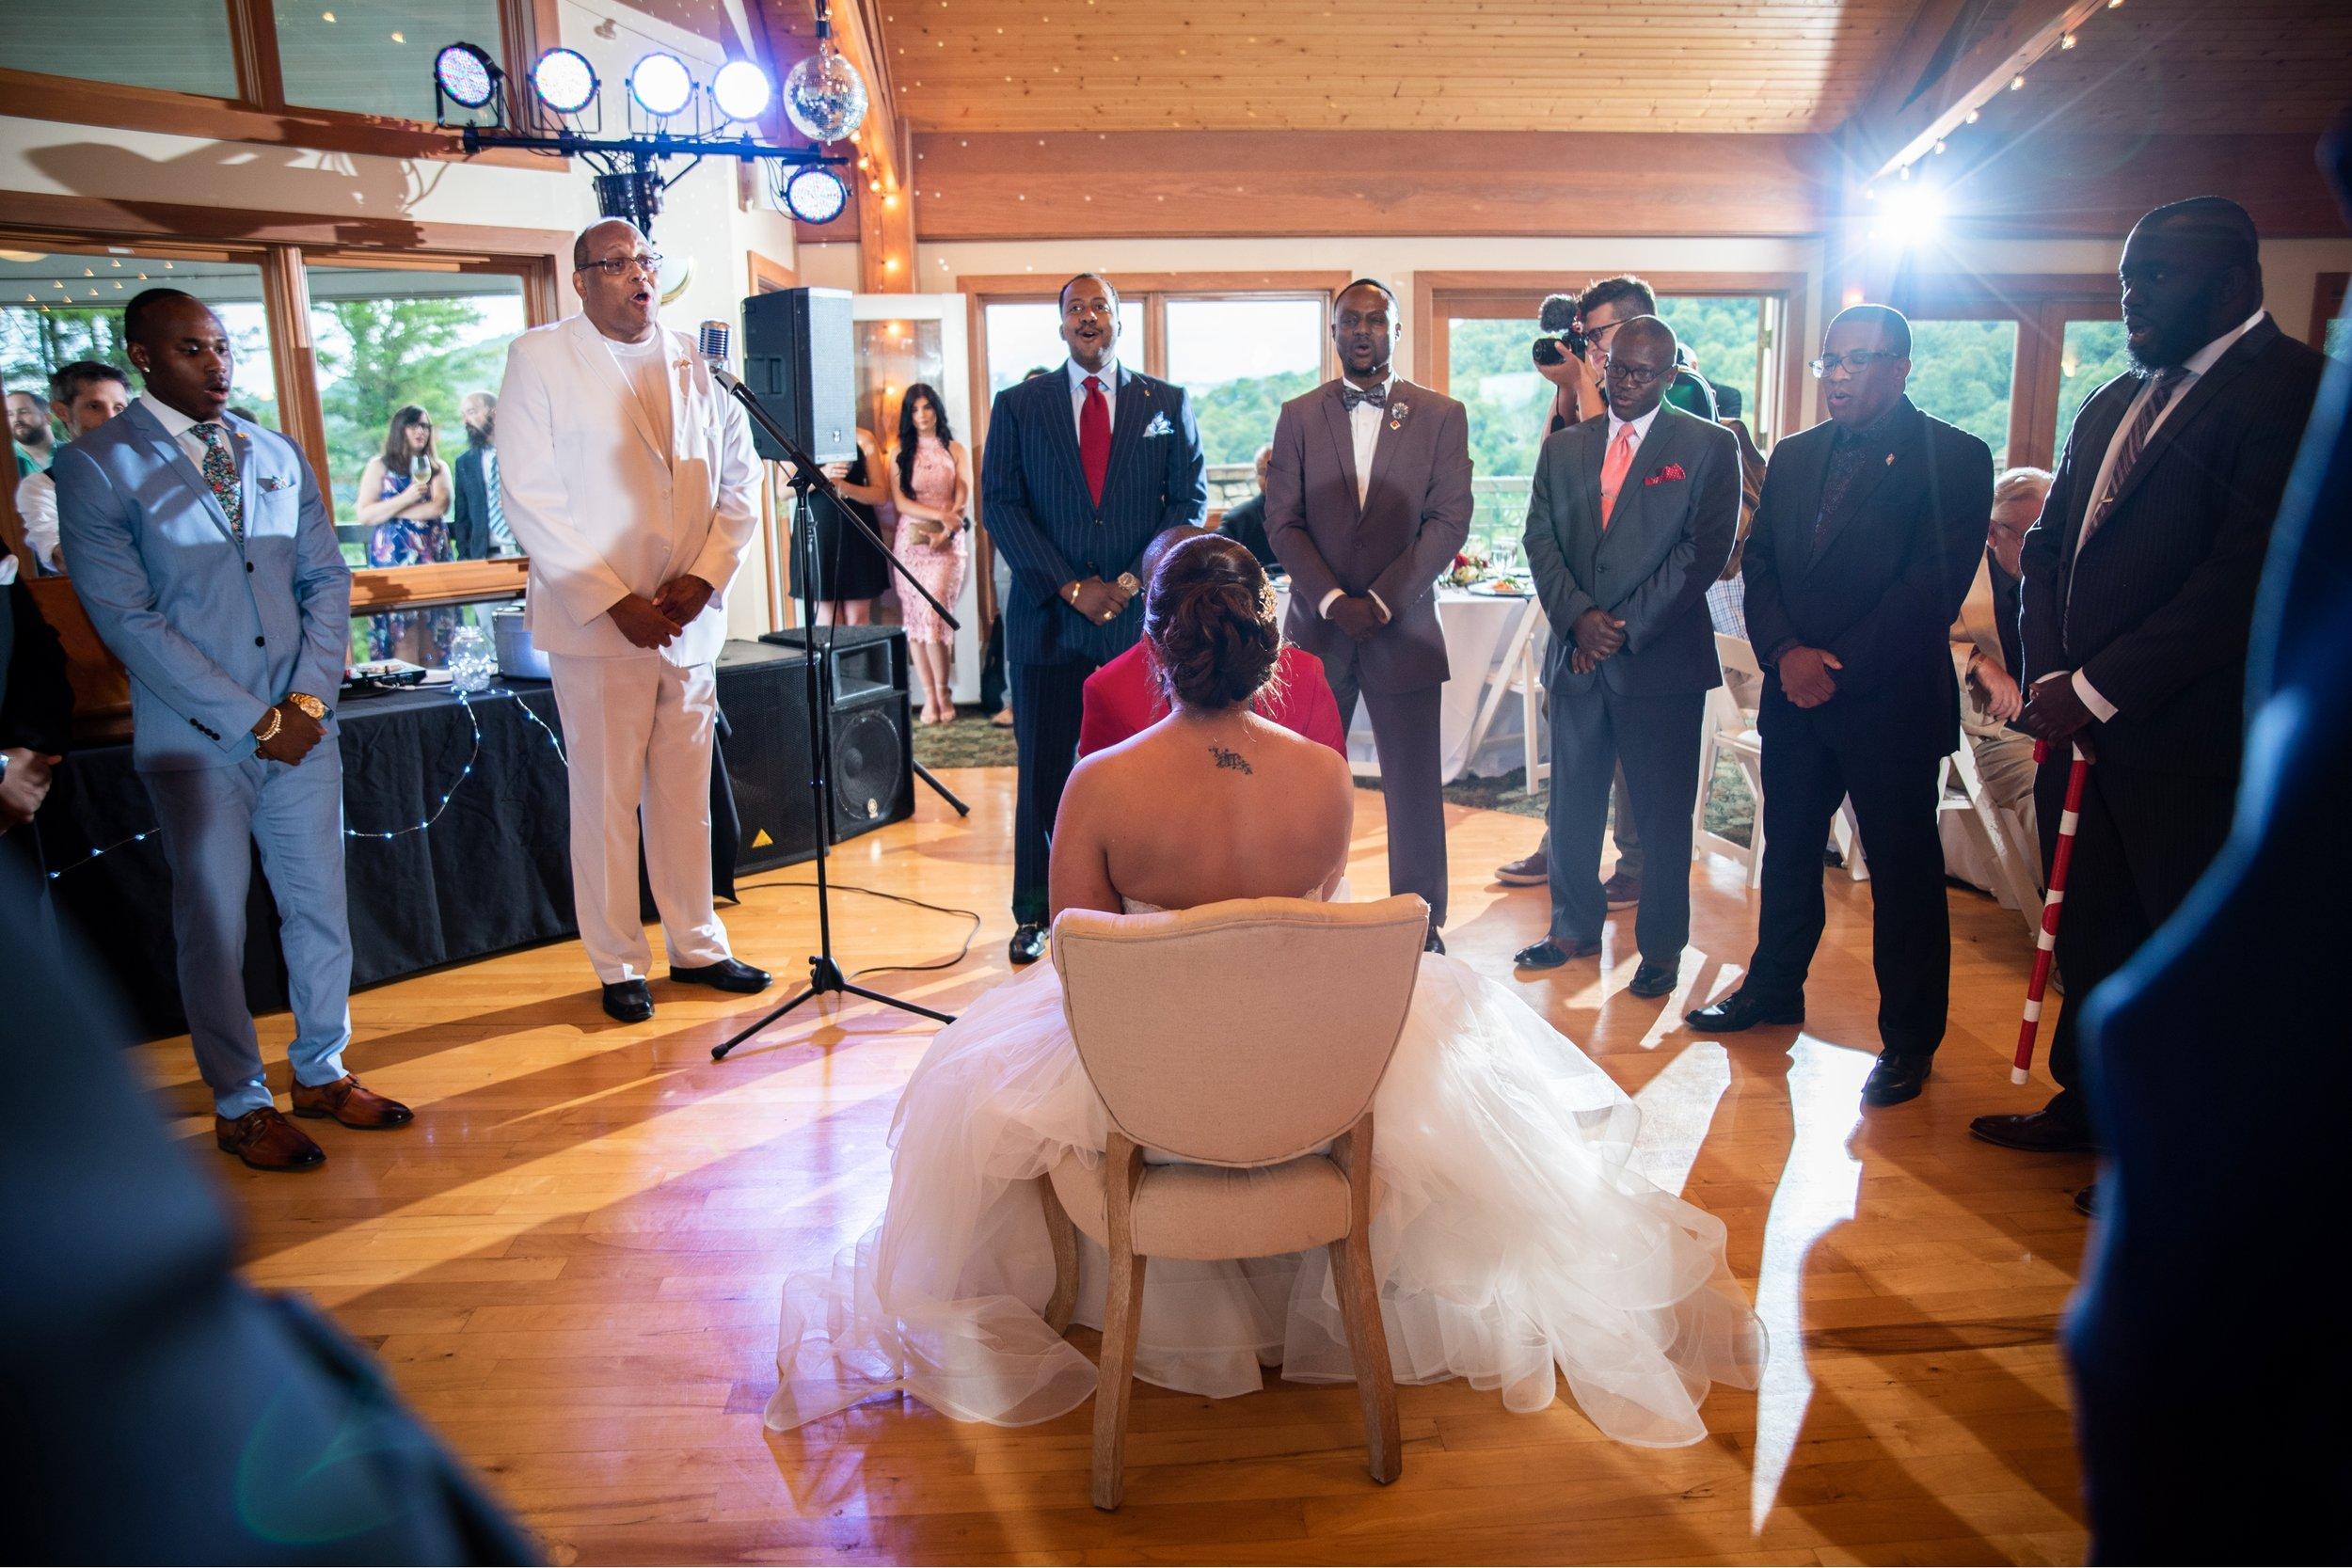 High Vista Weddings - Asheville Vendors 3 13.jpg